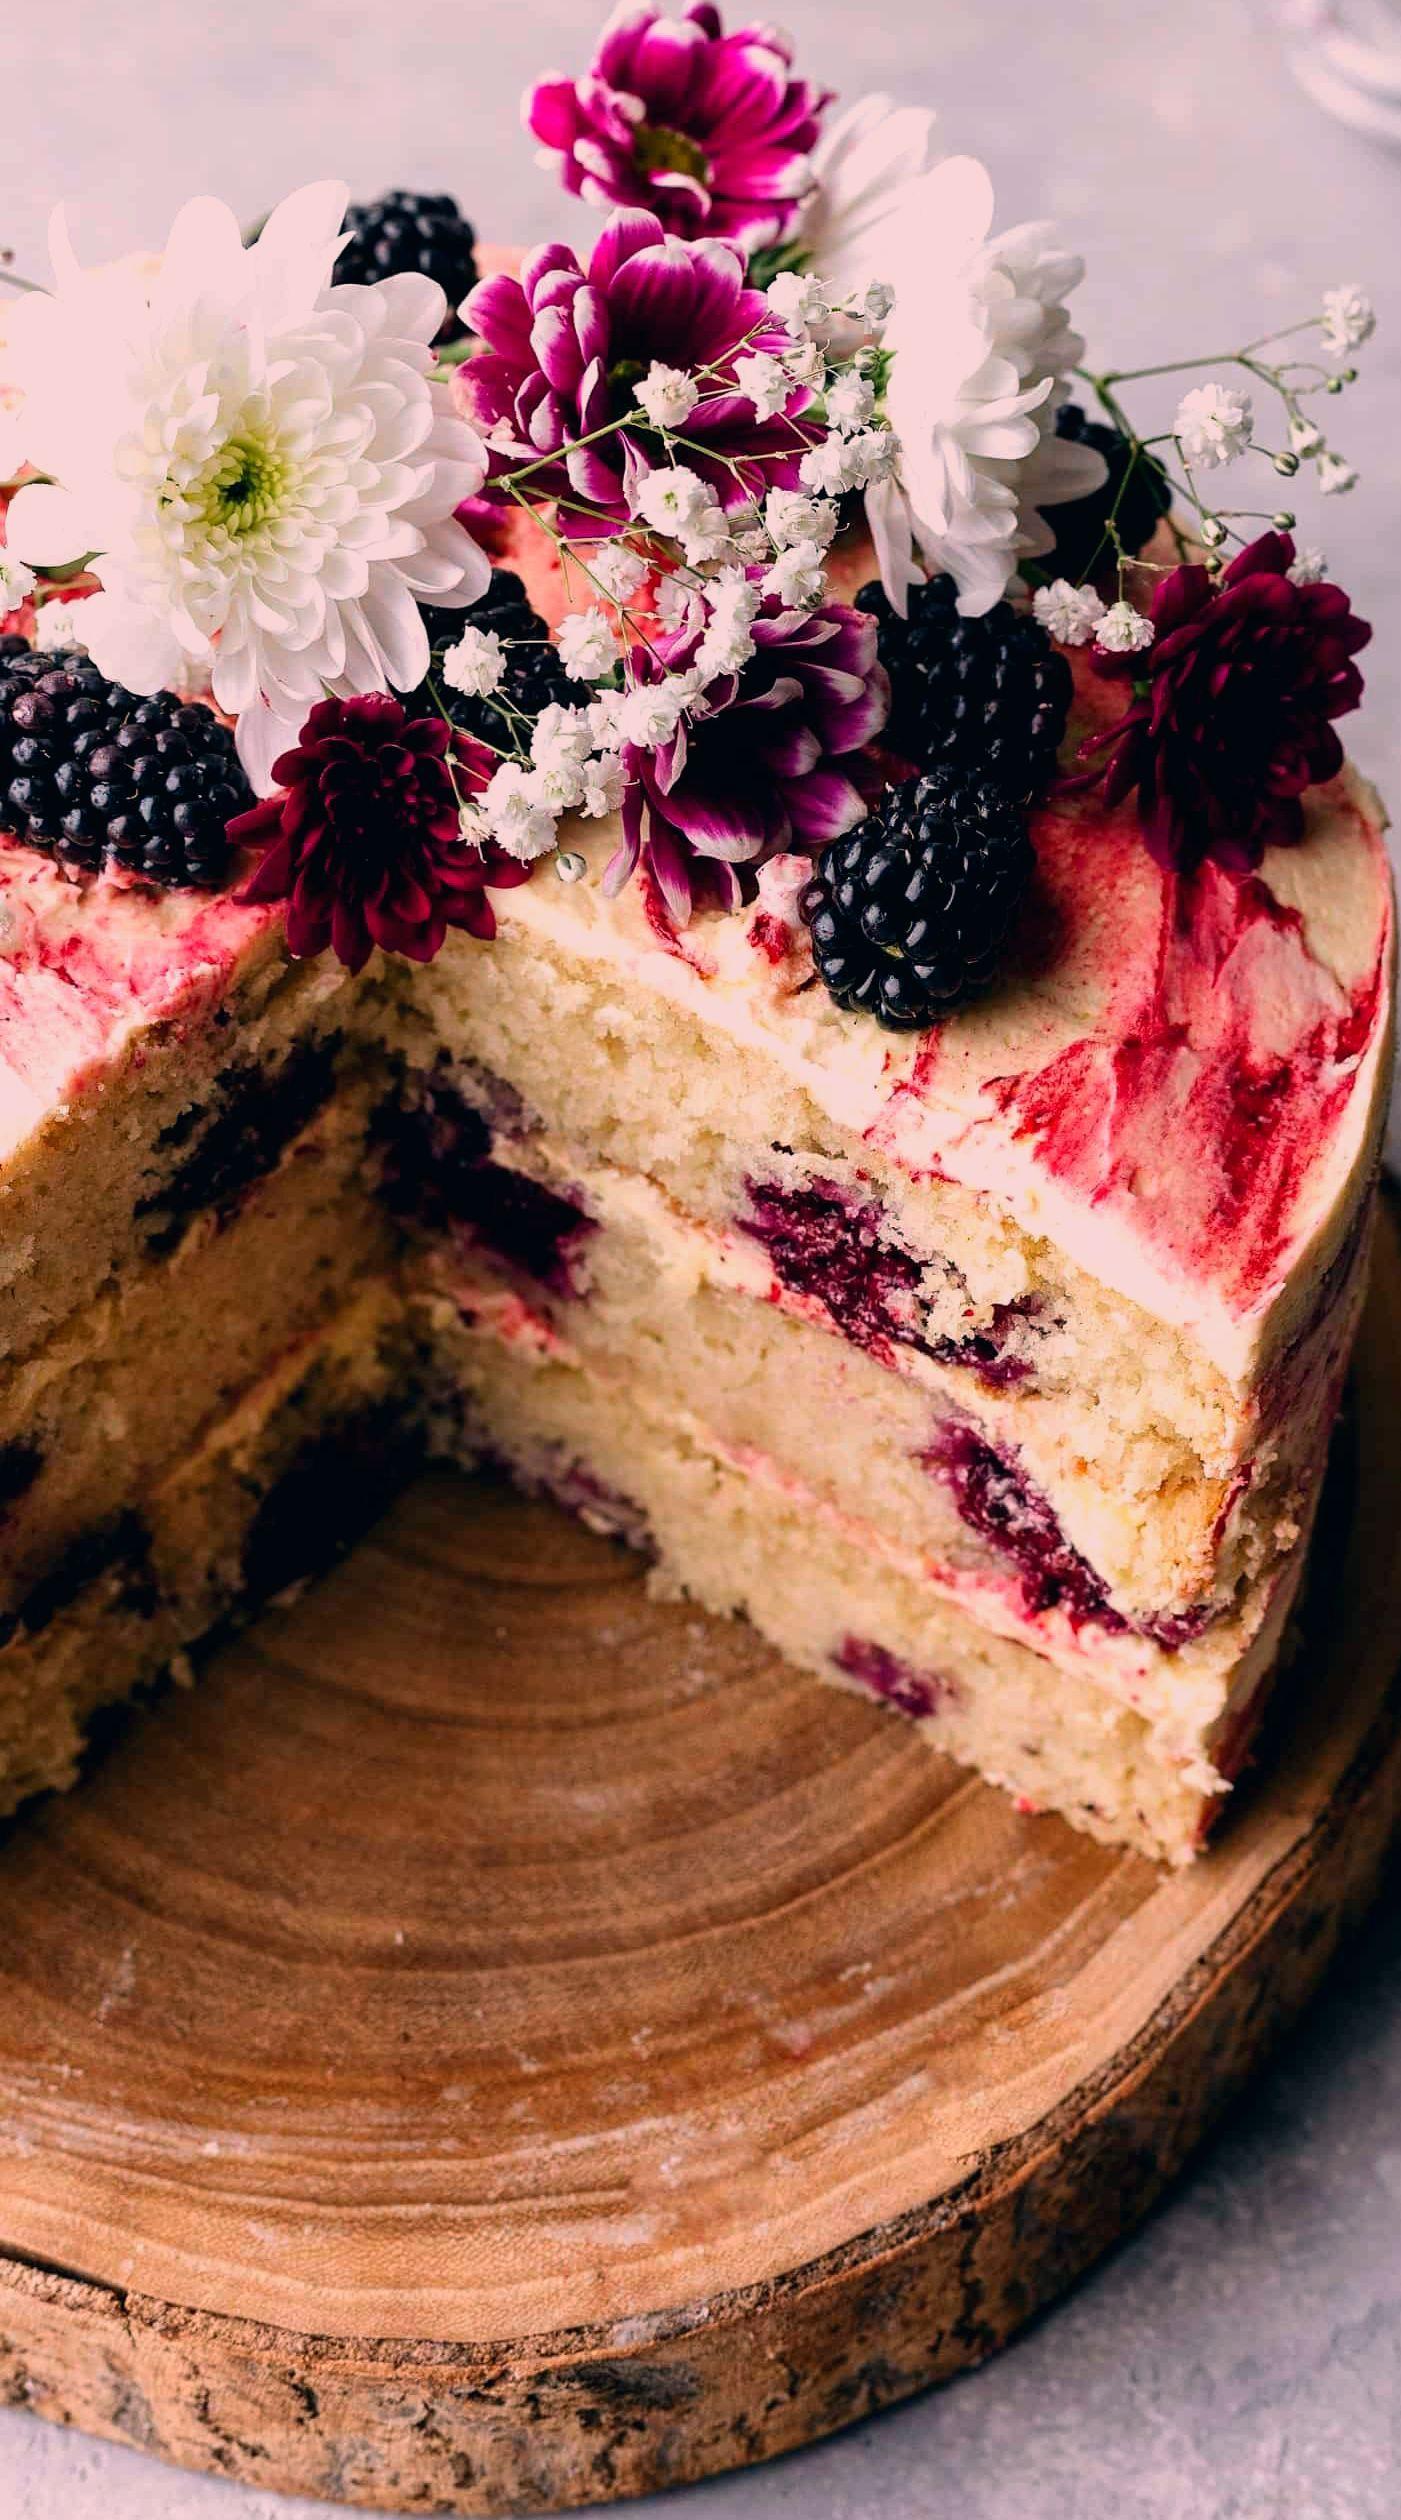 Blackberry And Gin Cake Cupful Of Kale In 2020 Vegane Kuchenrezepte Dessert Rezepte Dessert Ideen